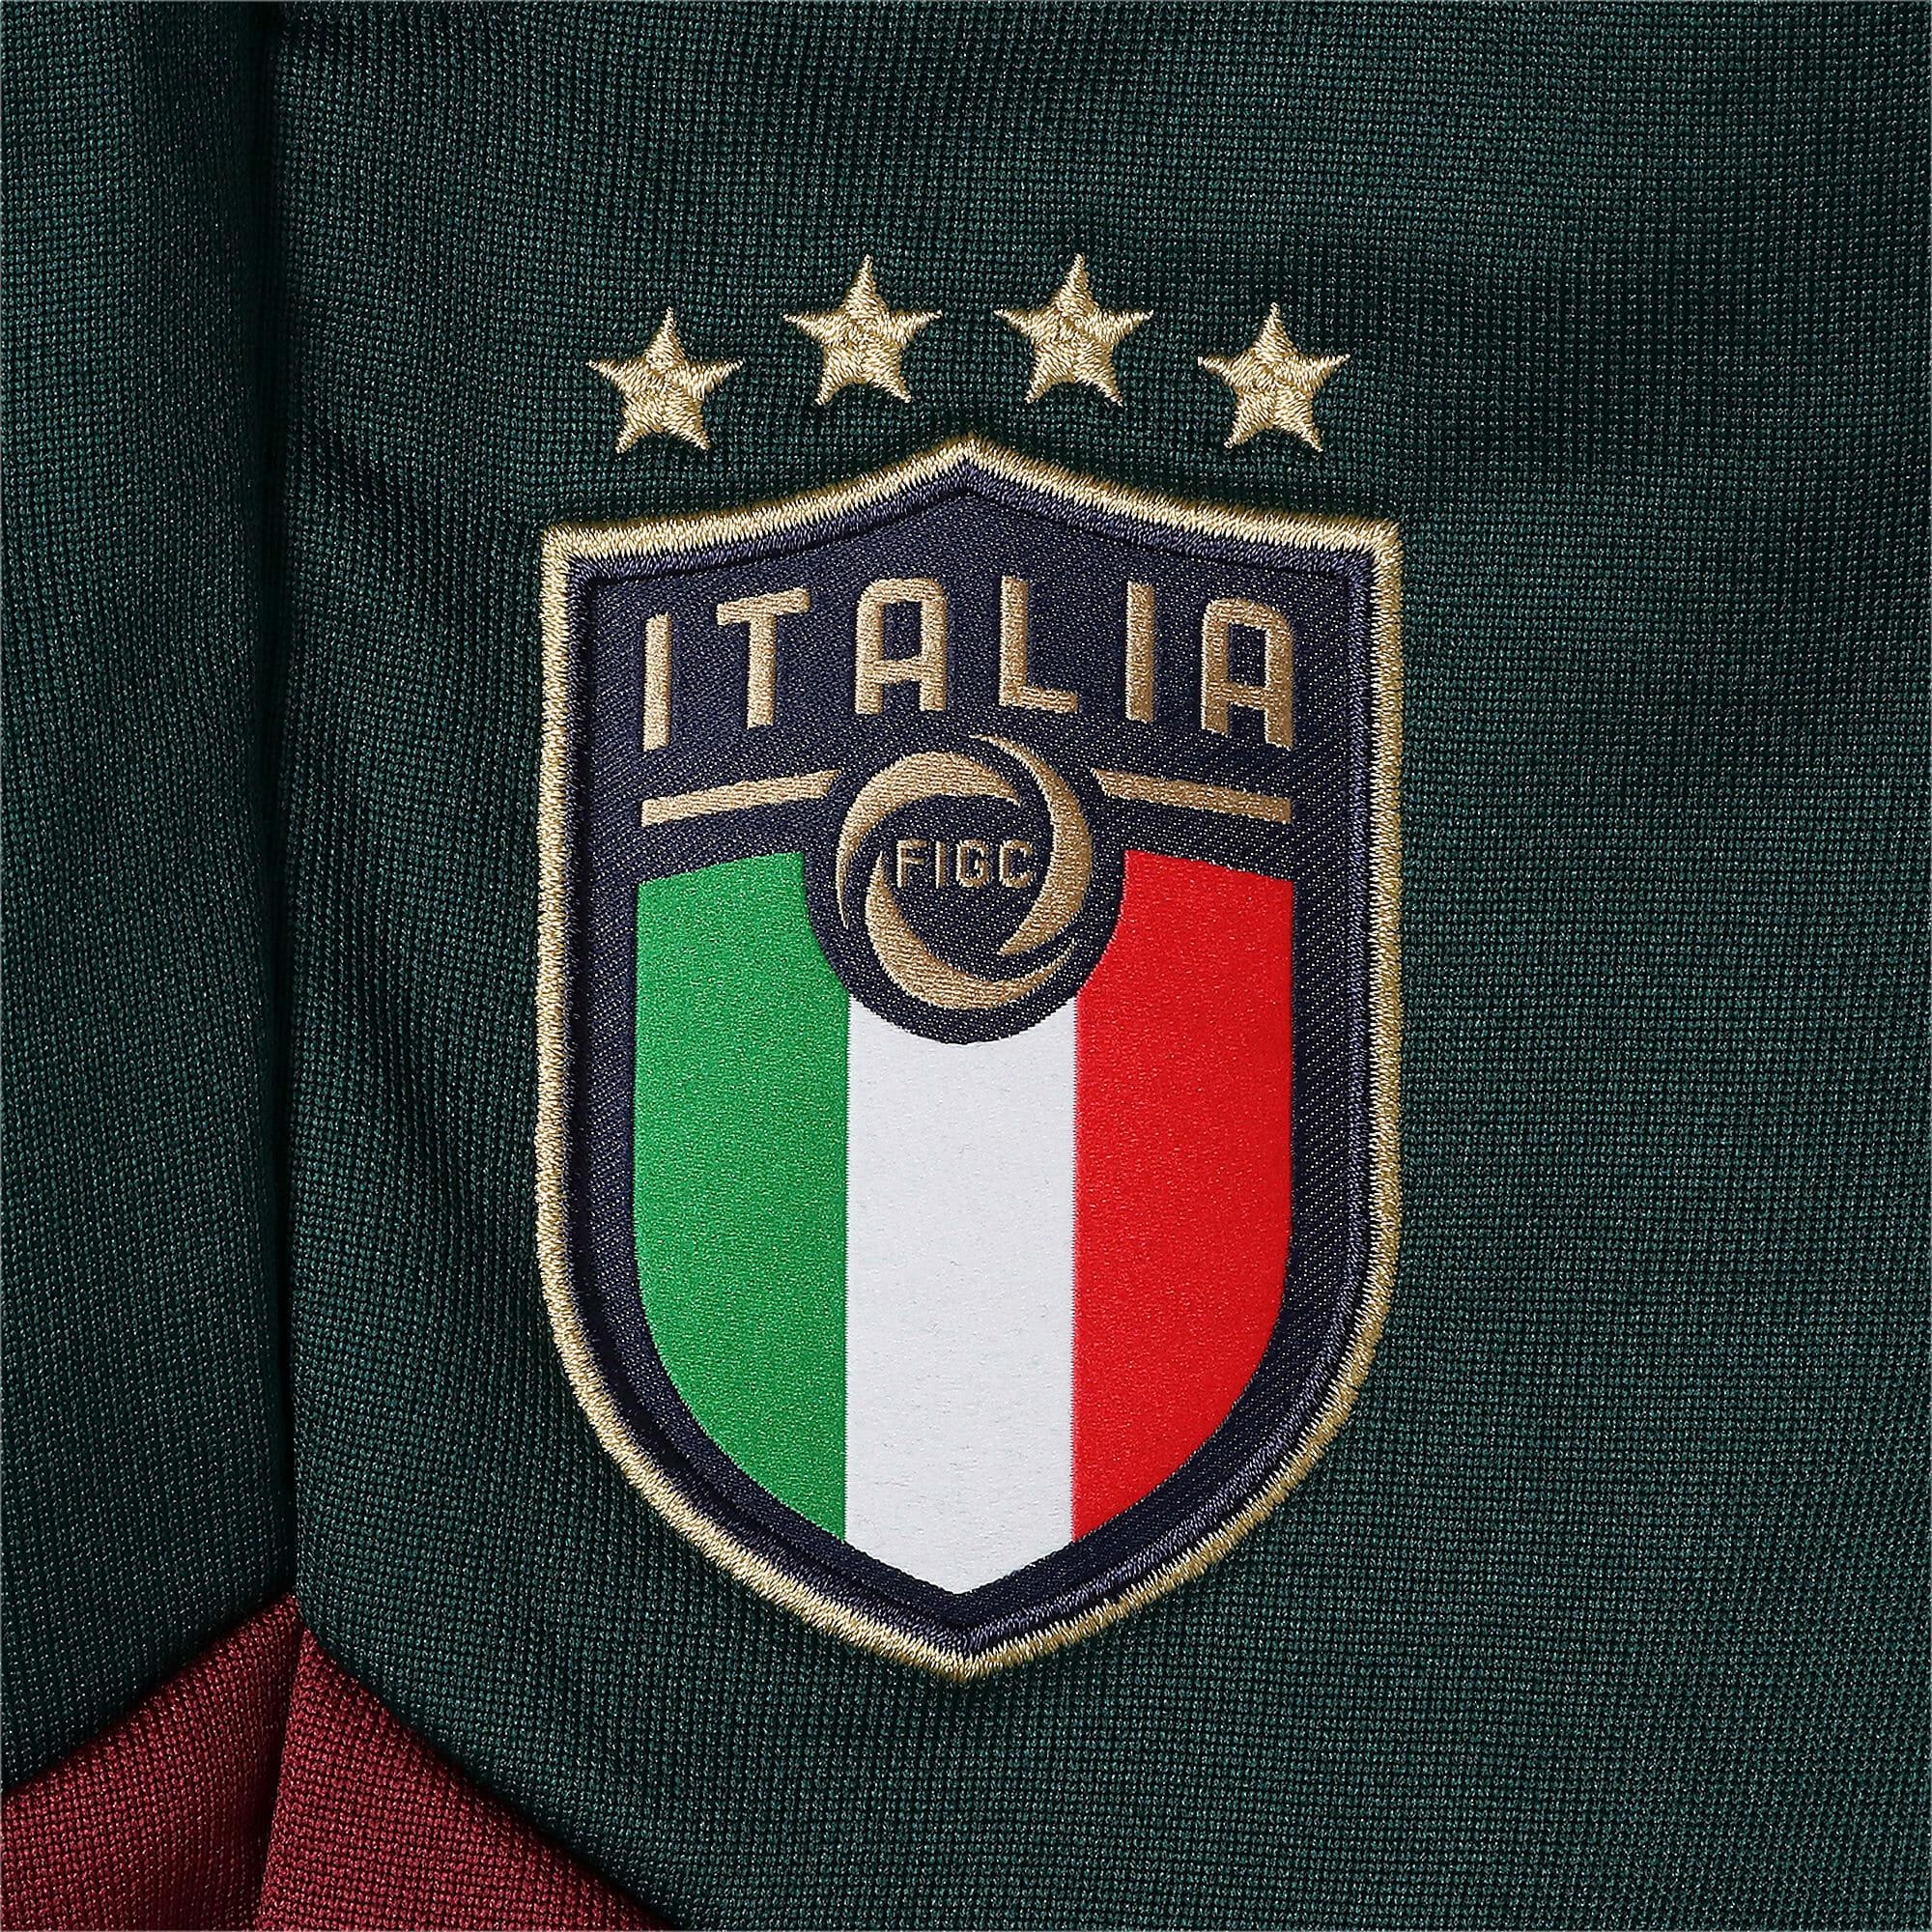 Thumbnail 8 of FIGC イタリア ICONIC MCS ショーツ, Ponderosa Pine-Peacoat, medium-JPN